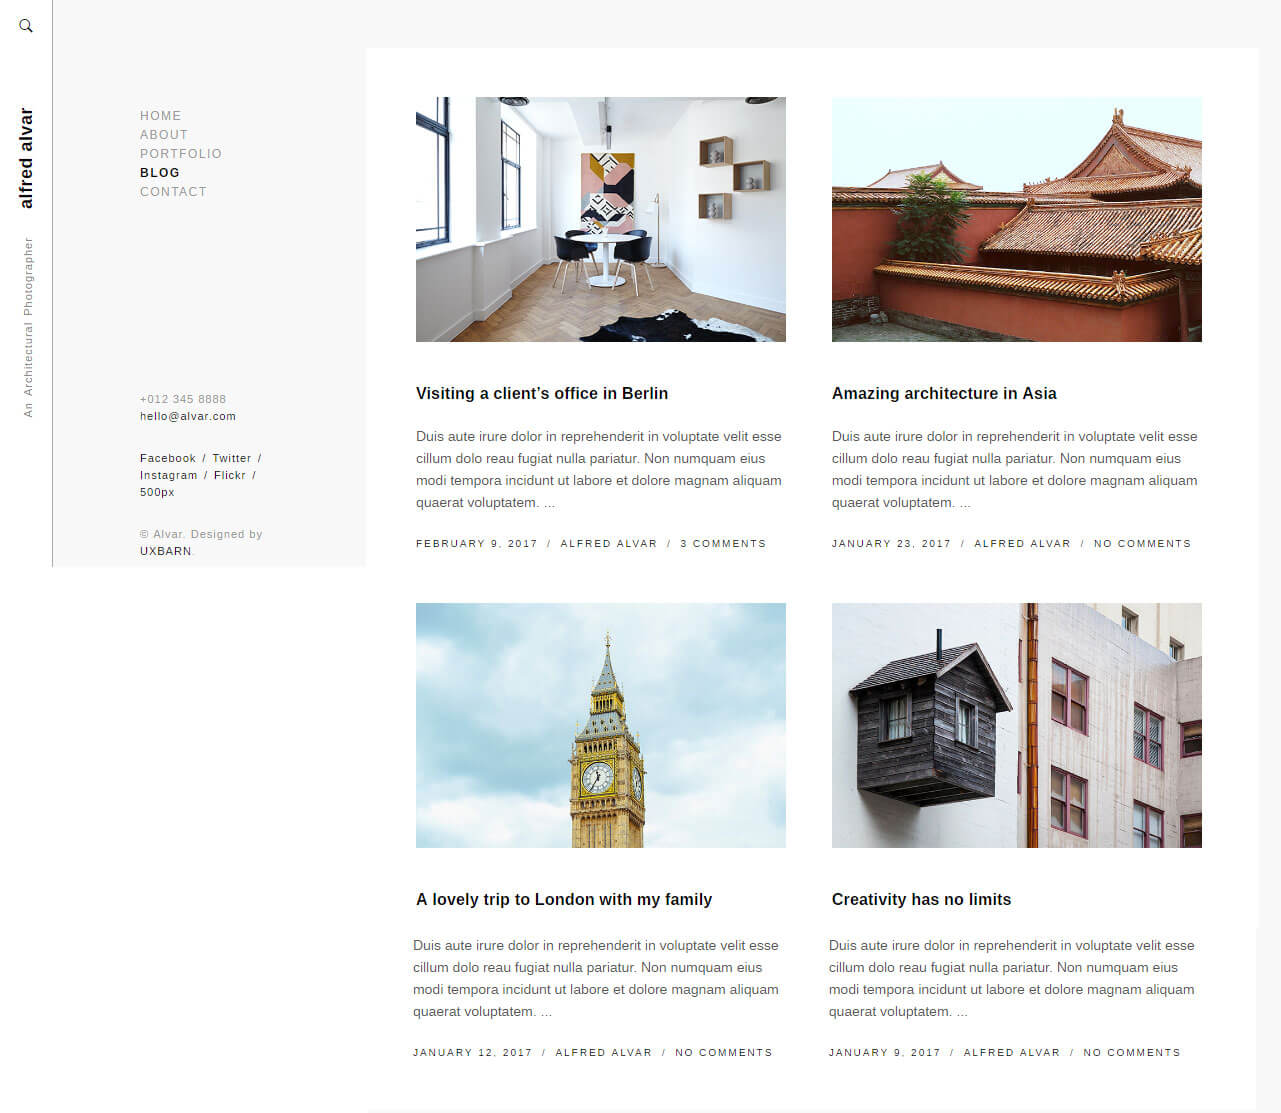 Giao diện Blog website nhiếp ảnh